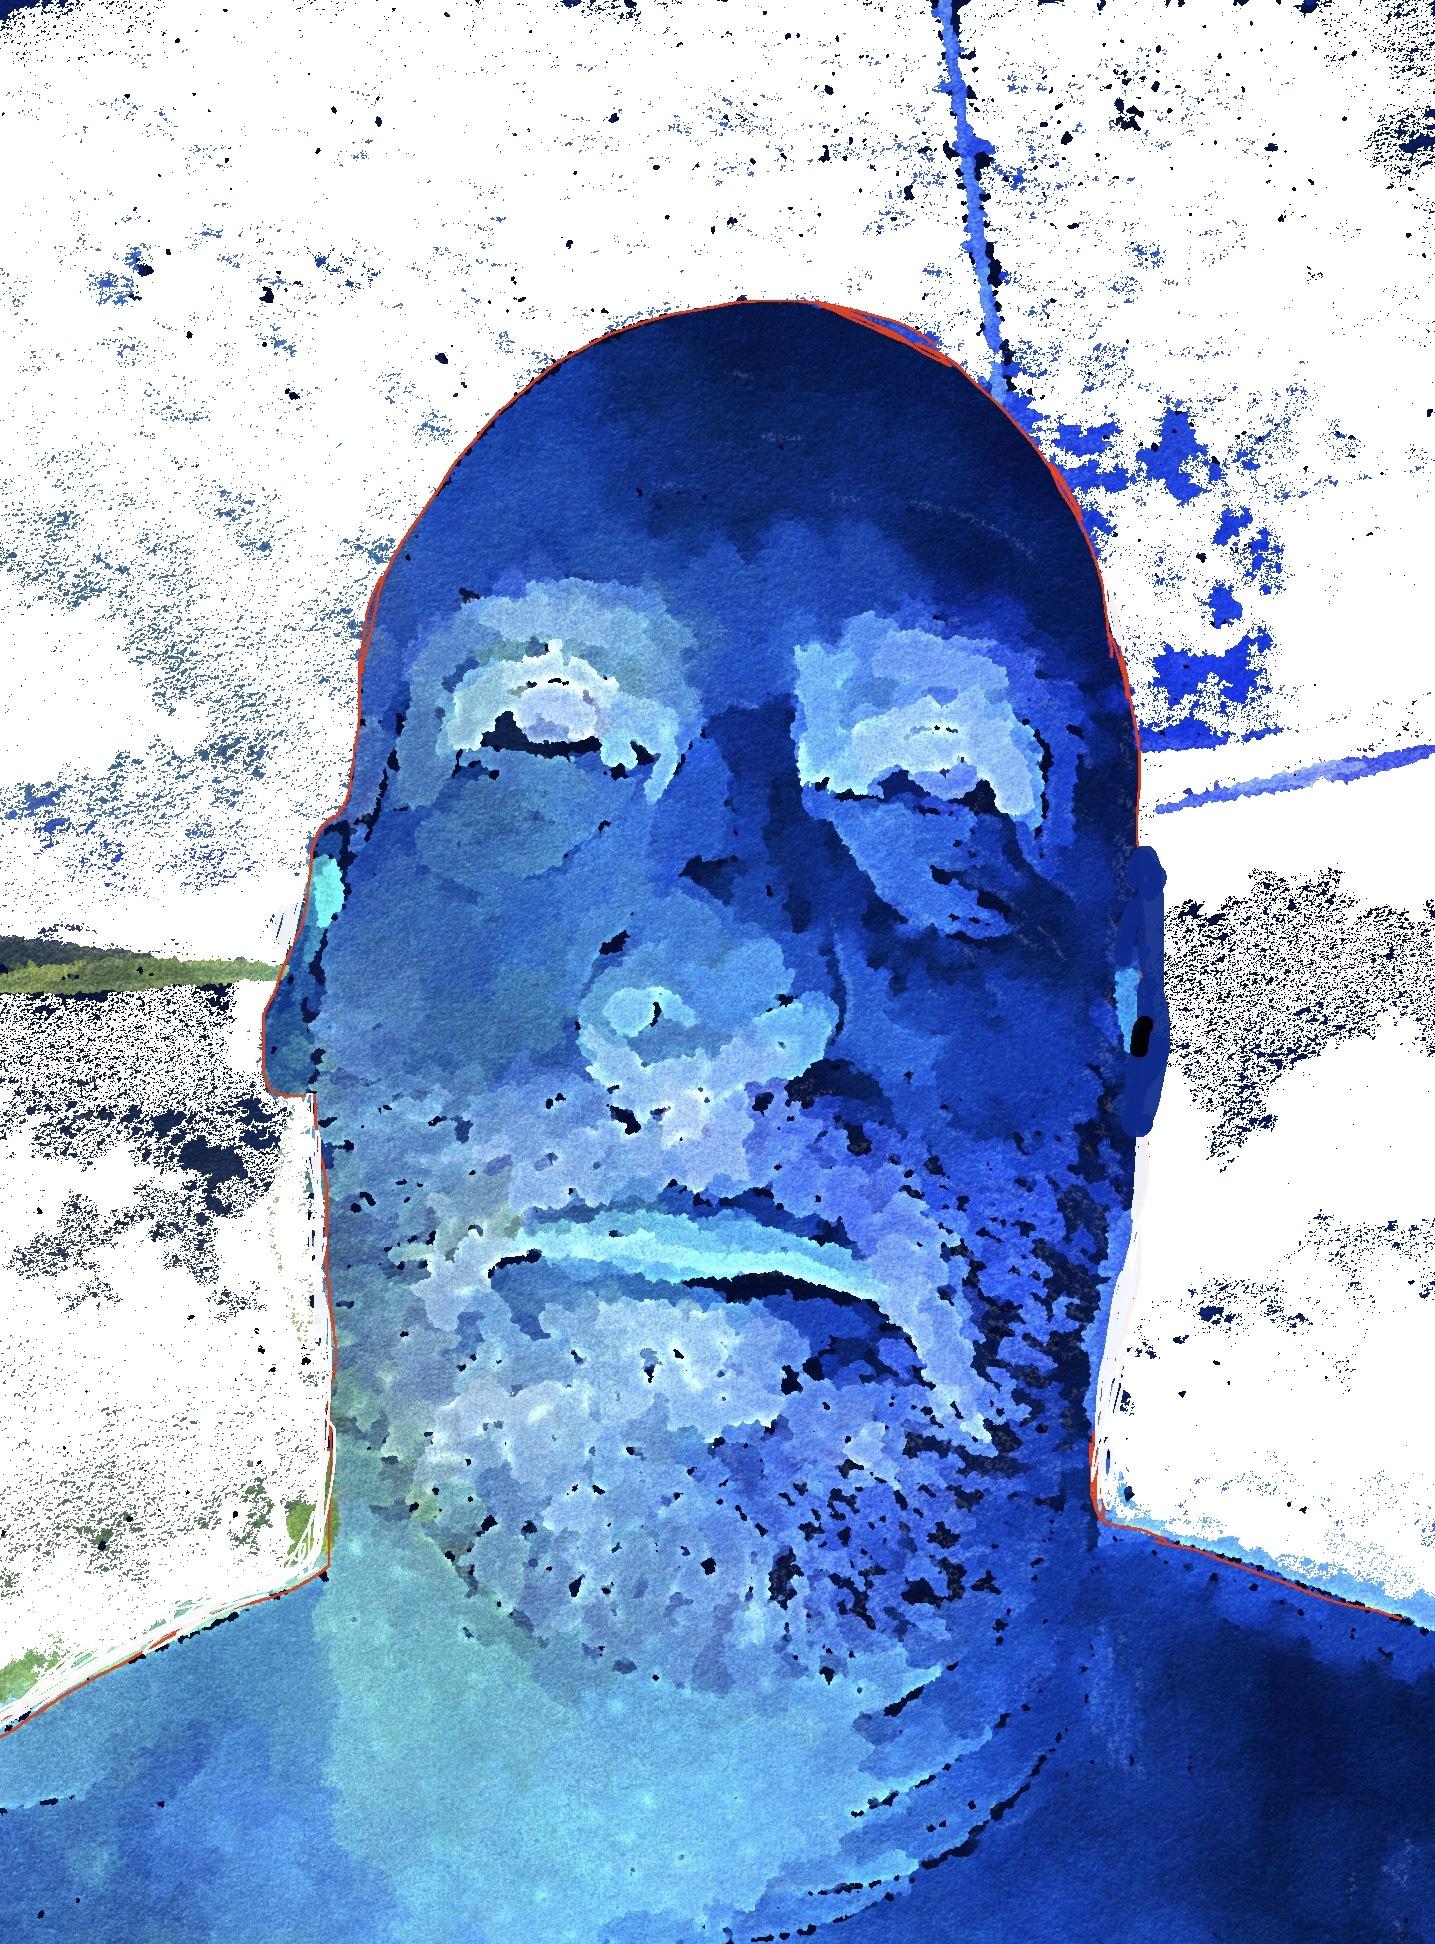 Crossroads Blues Selfie (2019) digitally manipulated photo